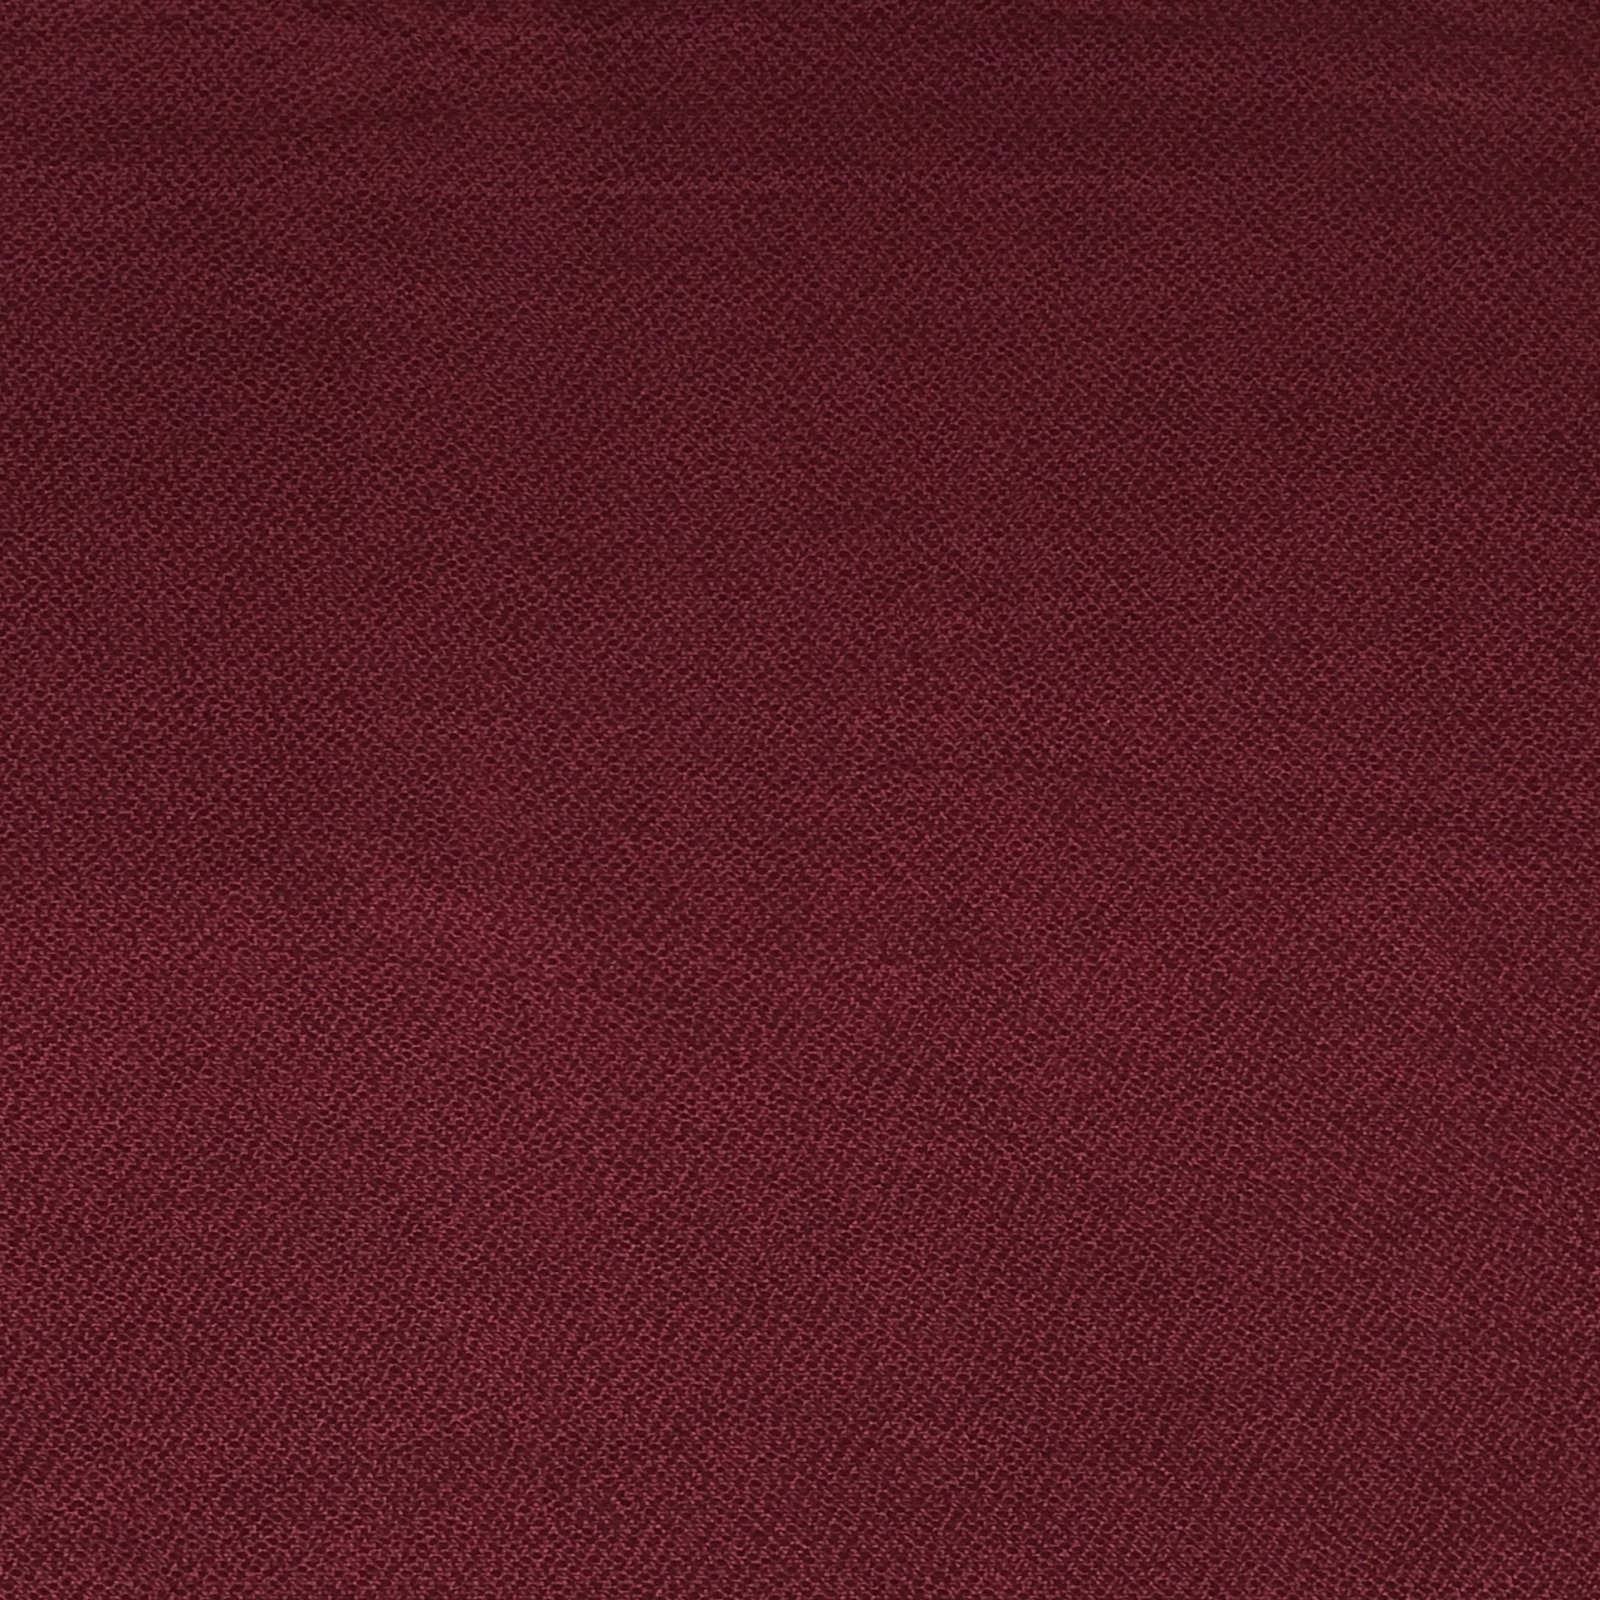 Rayon Crepe - Scarlet